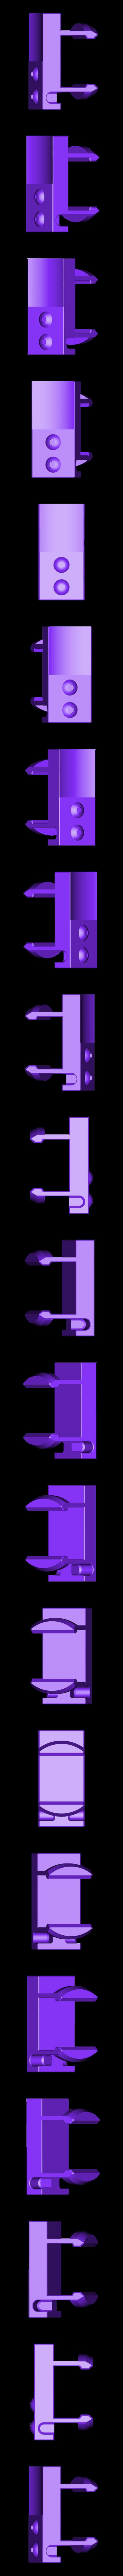 D-ring mount.stl Download STL file Graflex Lightsaber • Template to 3D print, DanielJosvai